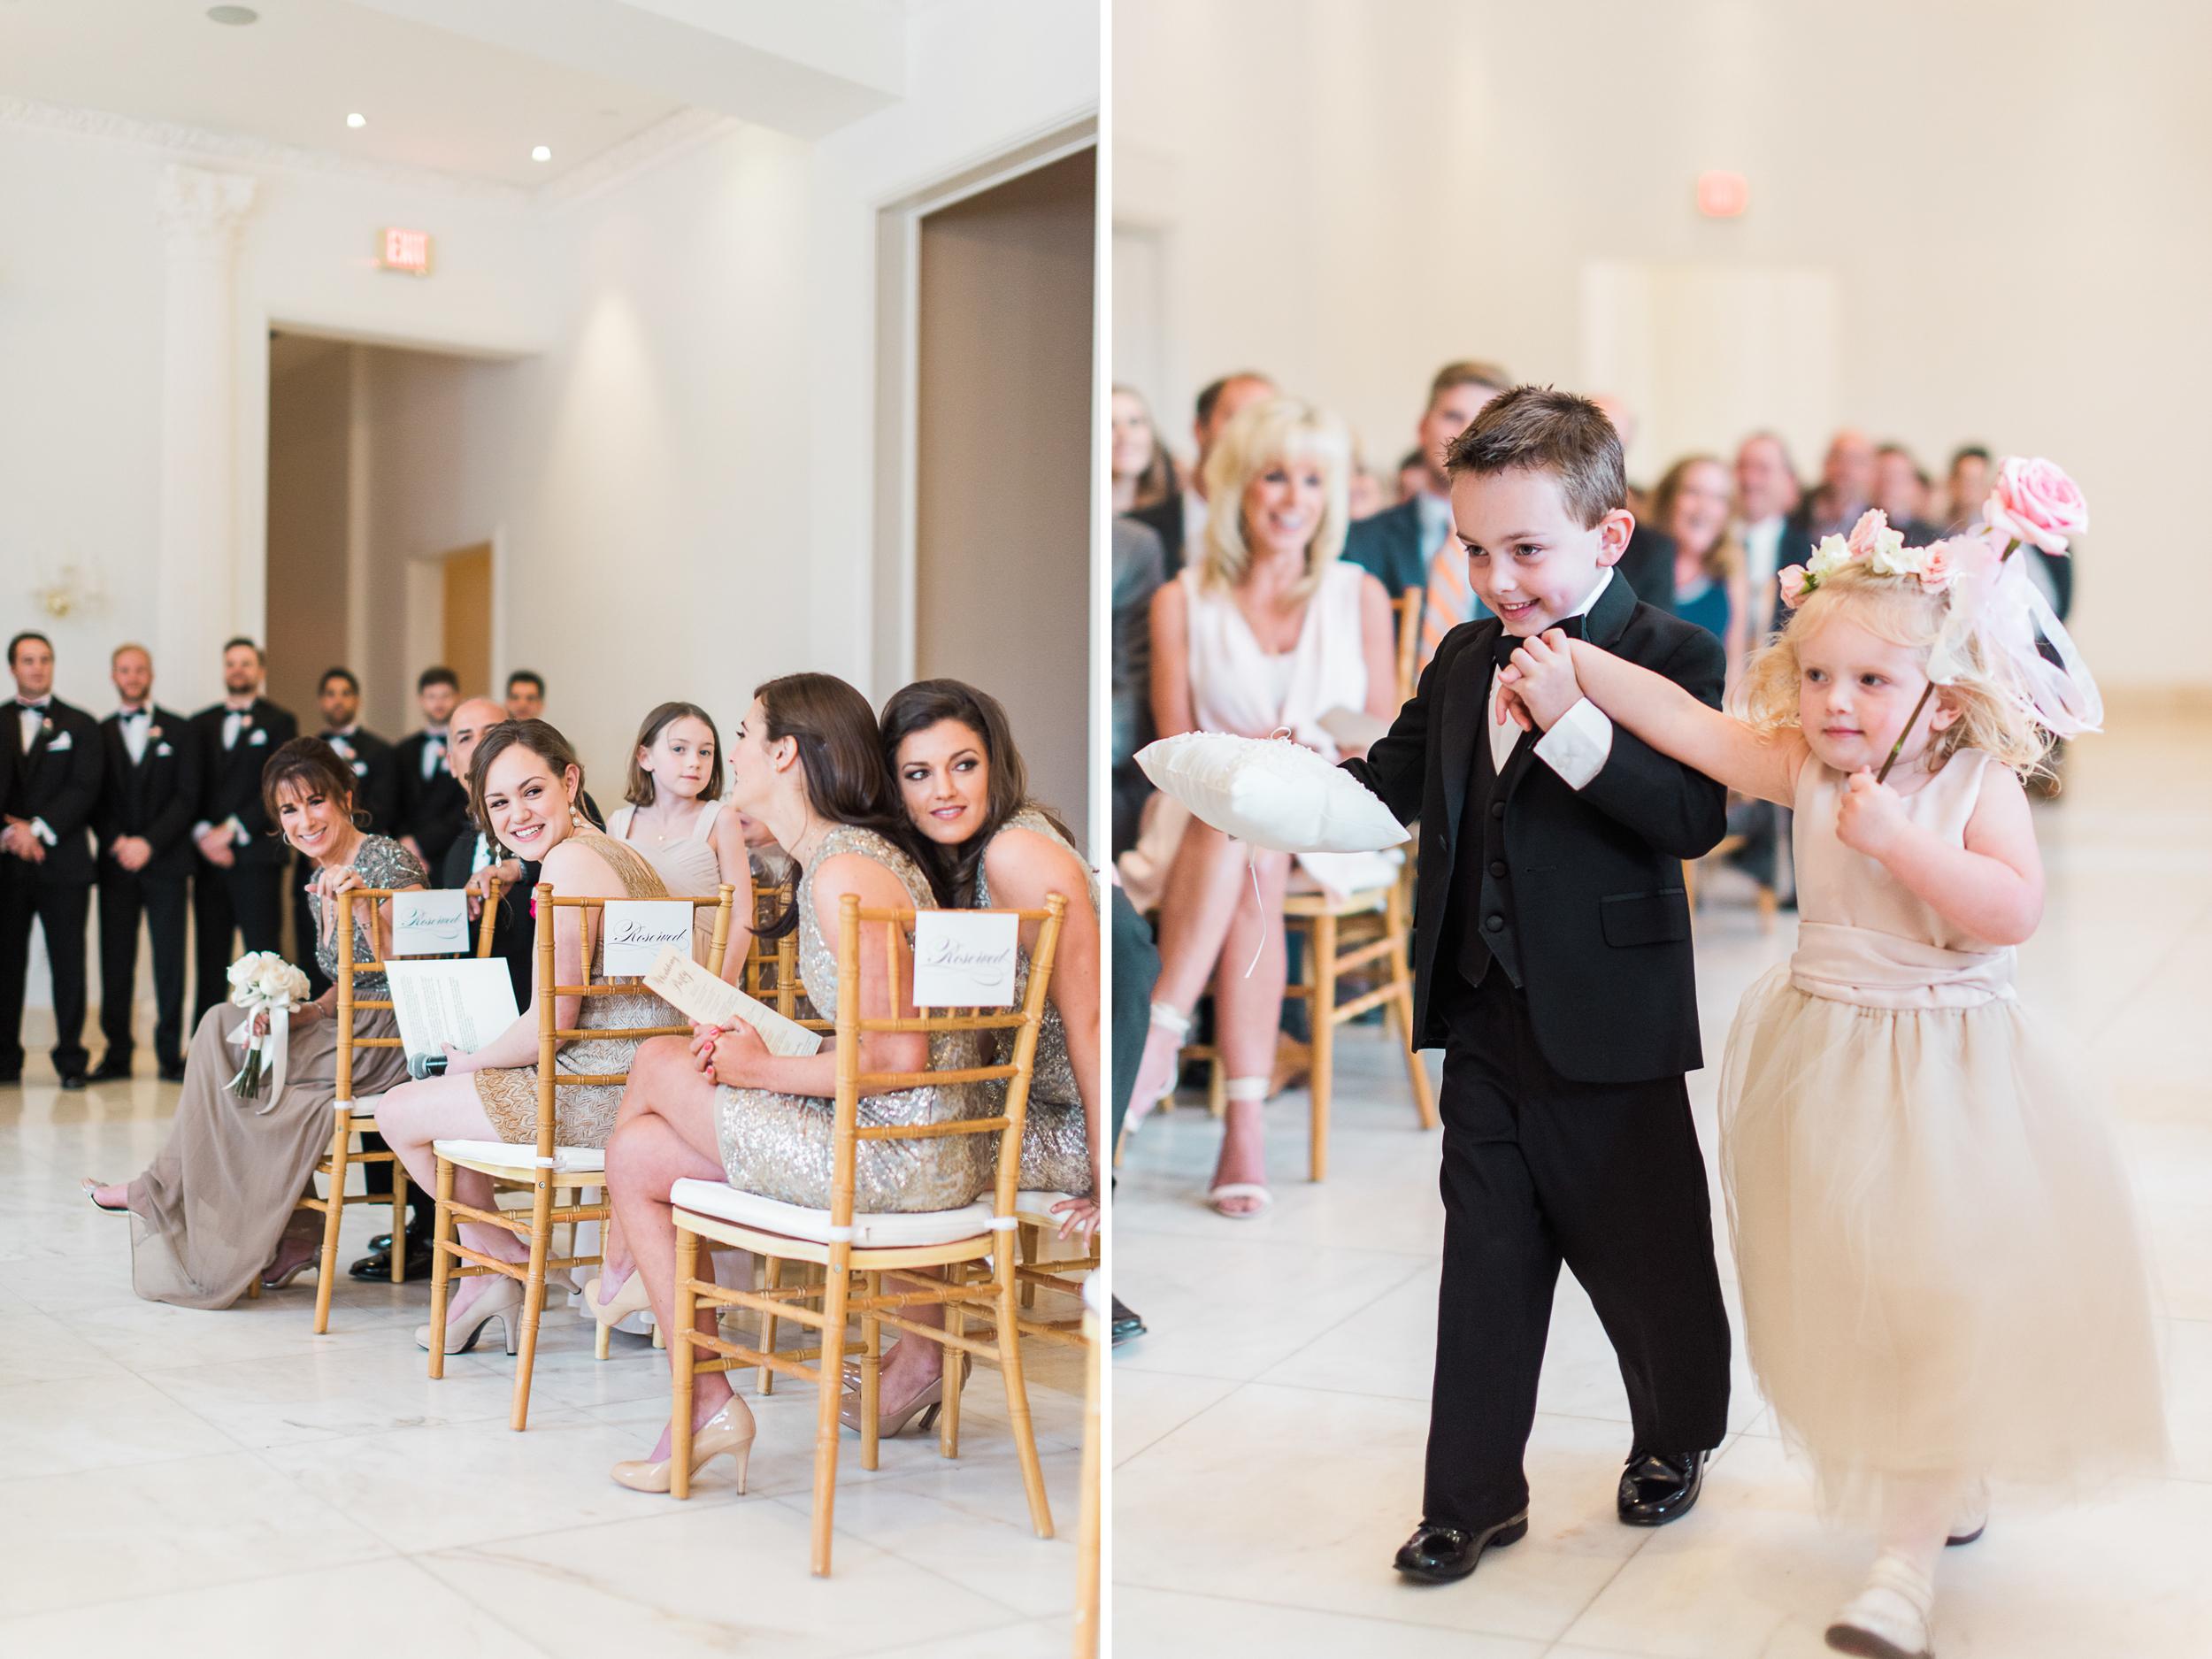 Dana-Fernandez-Photography-Houston-Wedding-Photographer-Style-Me-Pretty-Film-Texas-Destination-Photographer-111.jpg